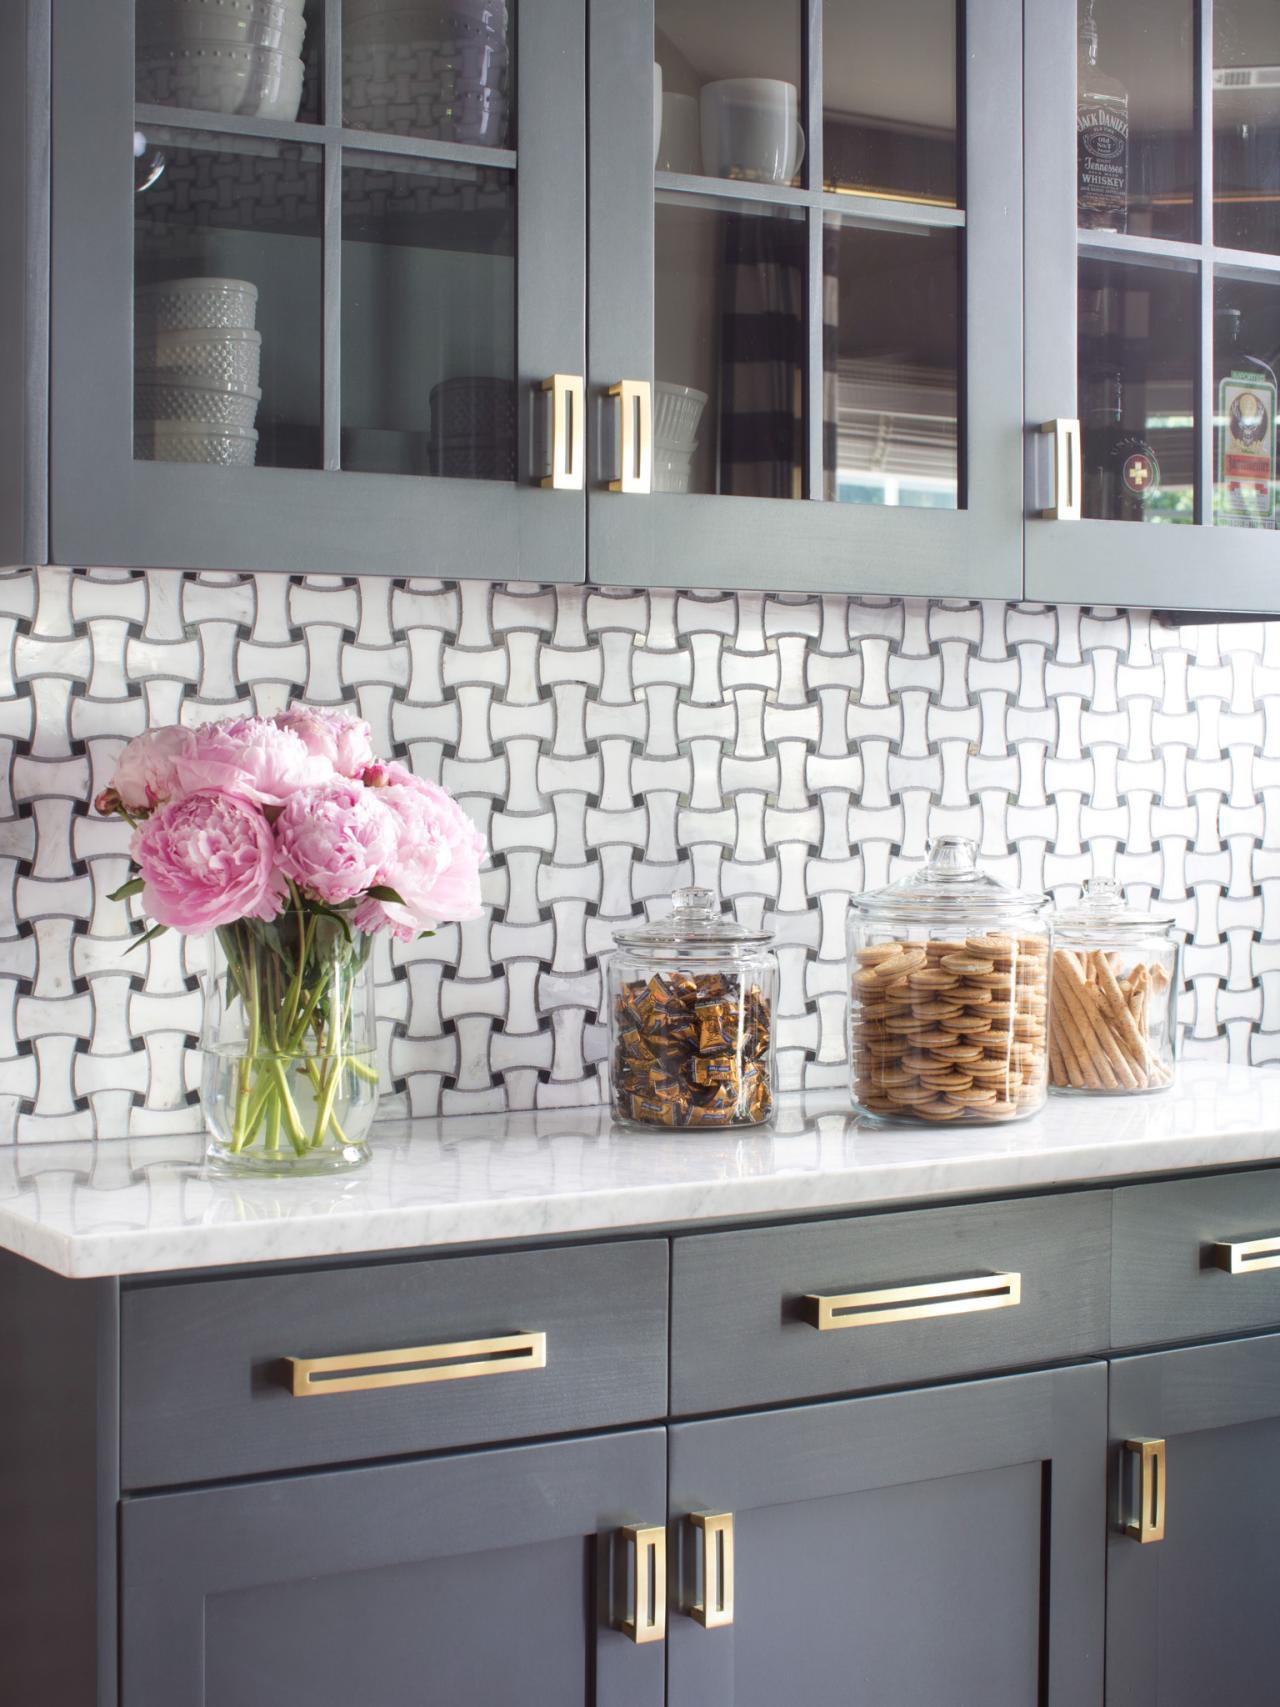 bpf_holiday-house_interior_upgrading_contractor_kitchen_buffet_wall_v-jpg-rend-hgtvcom-1280-1707